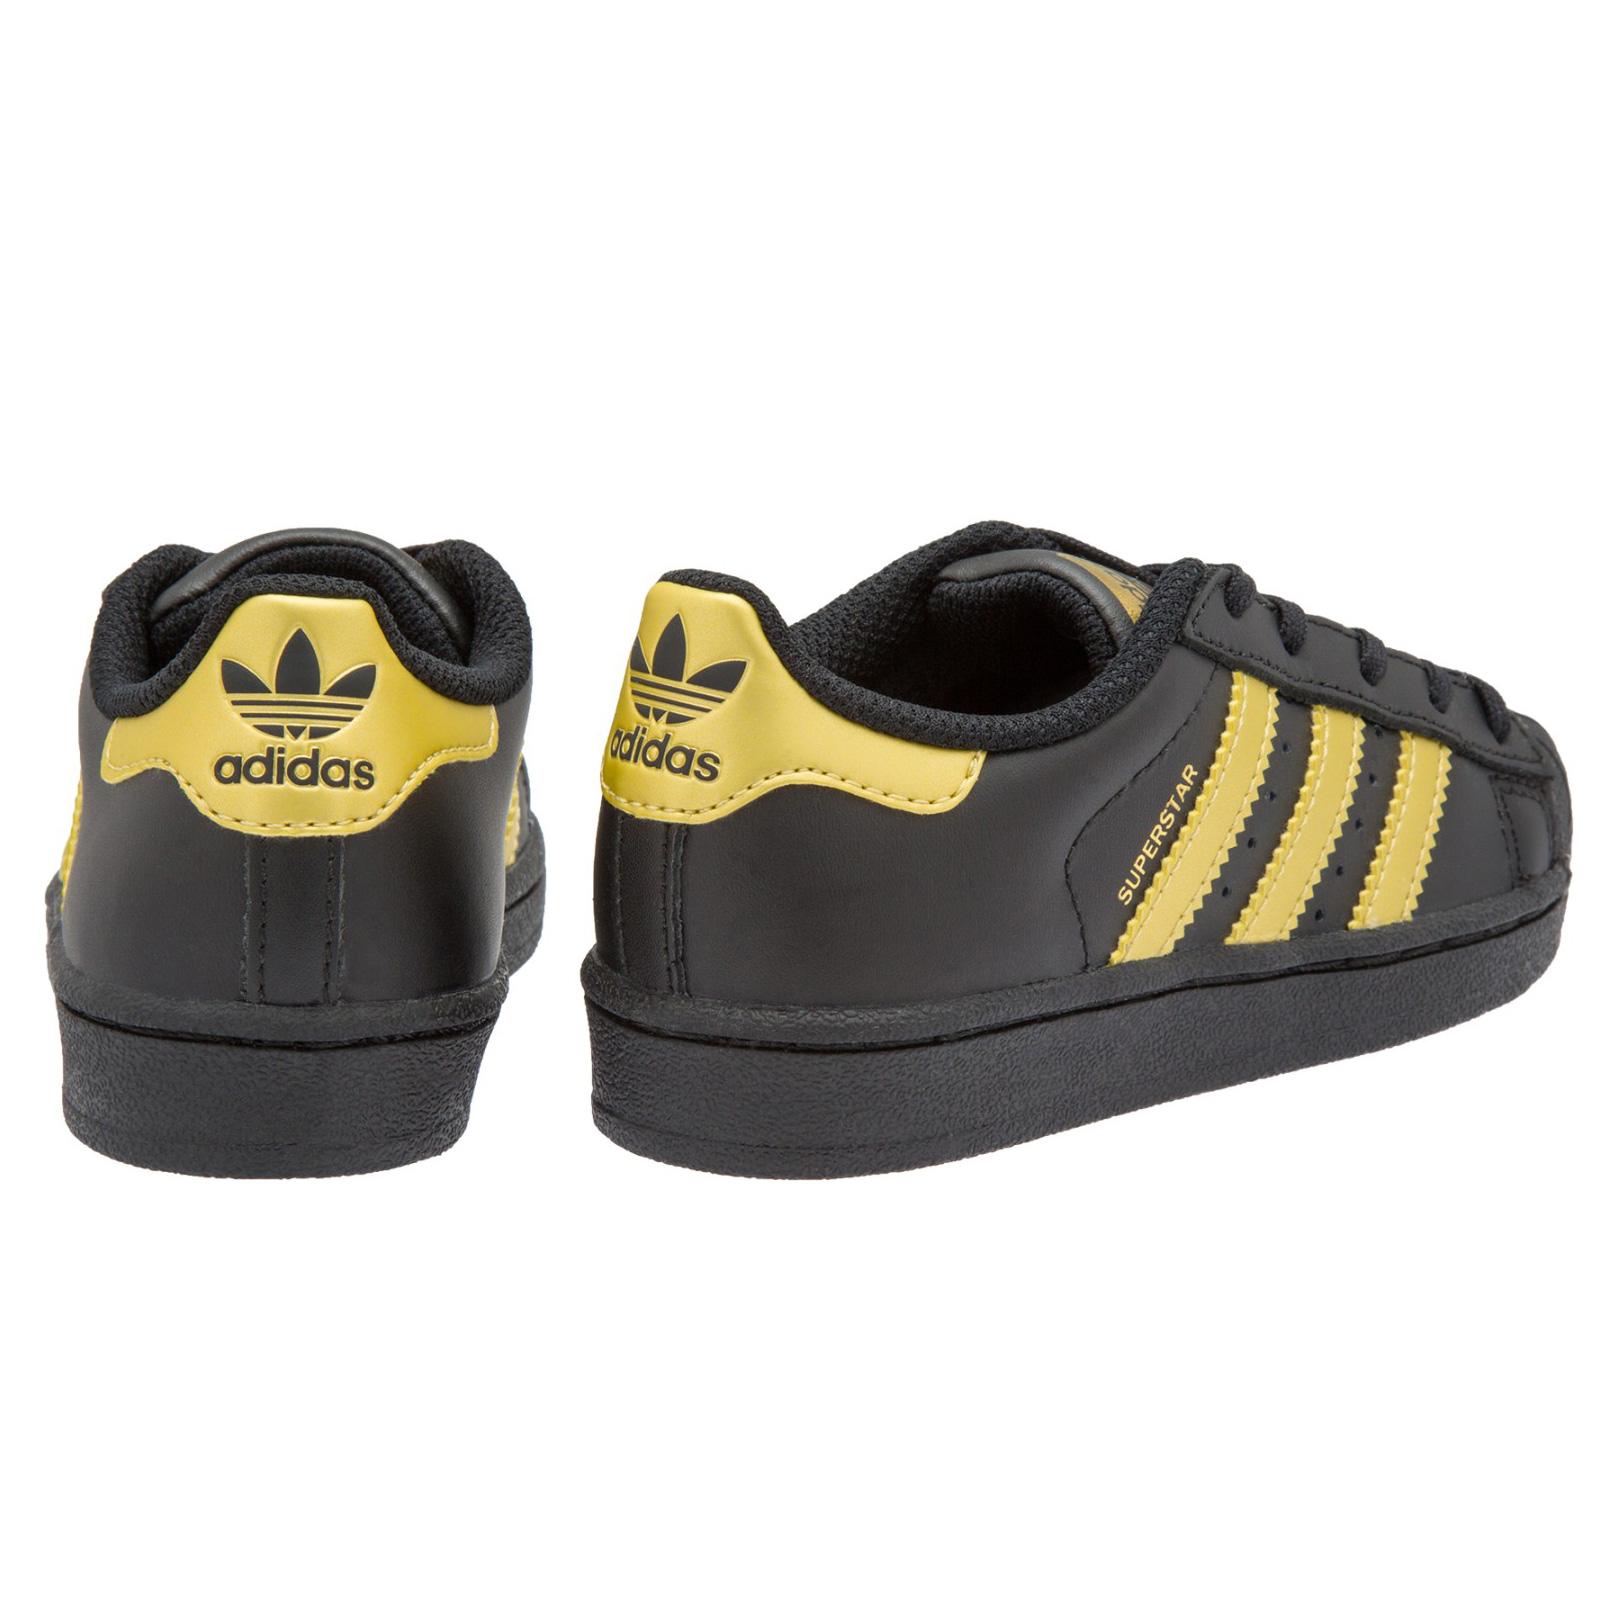 Details about Adidas Originals Superstar Kids Shoes Sneakers BB2873 Black Gold show original title